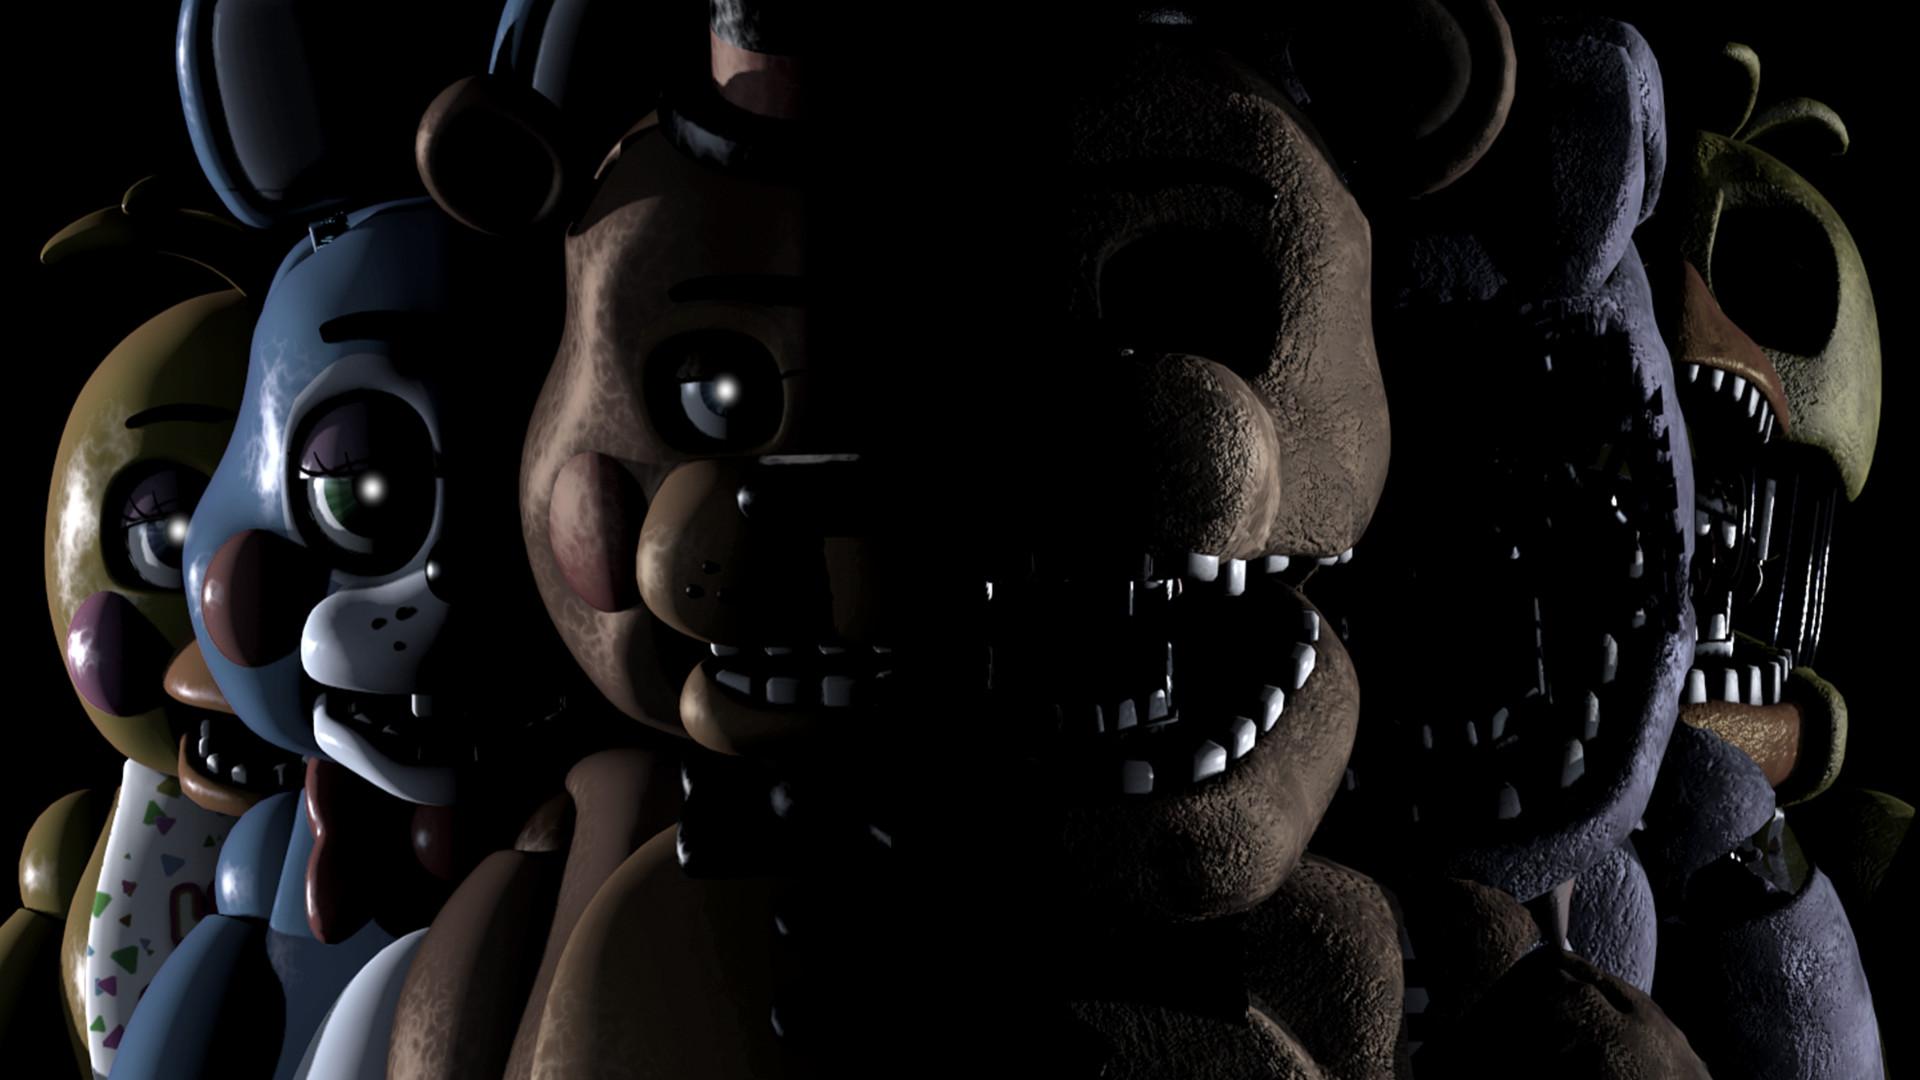 Five Nights at Freddy's Wallpaper 1080p (2)